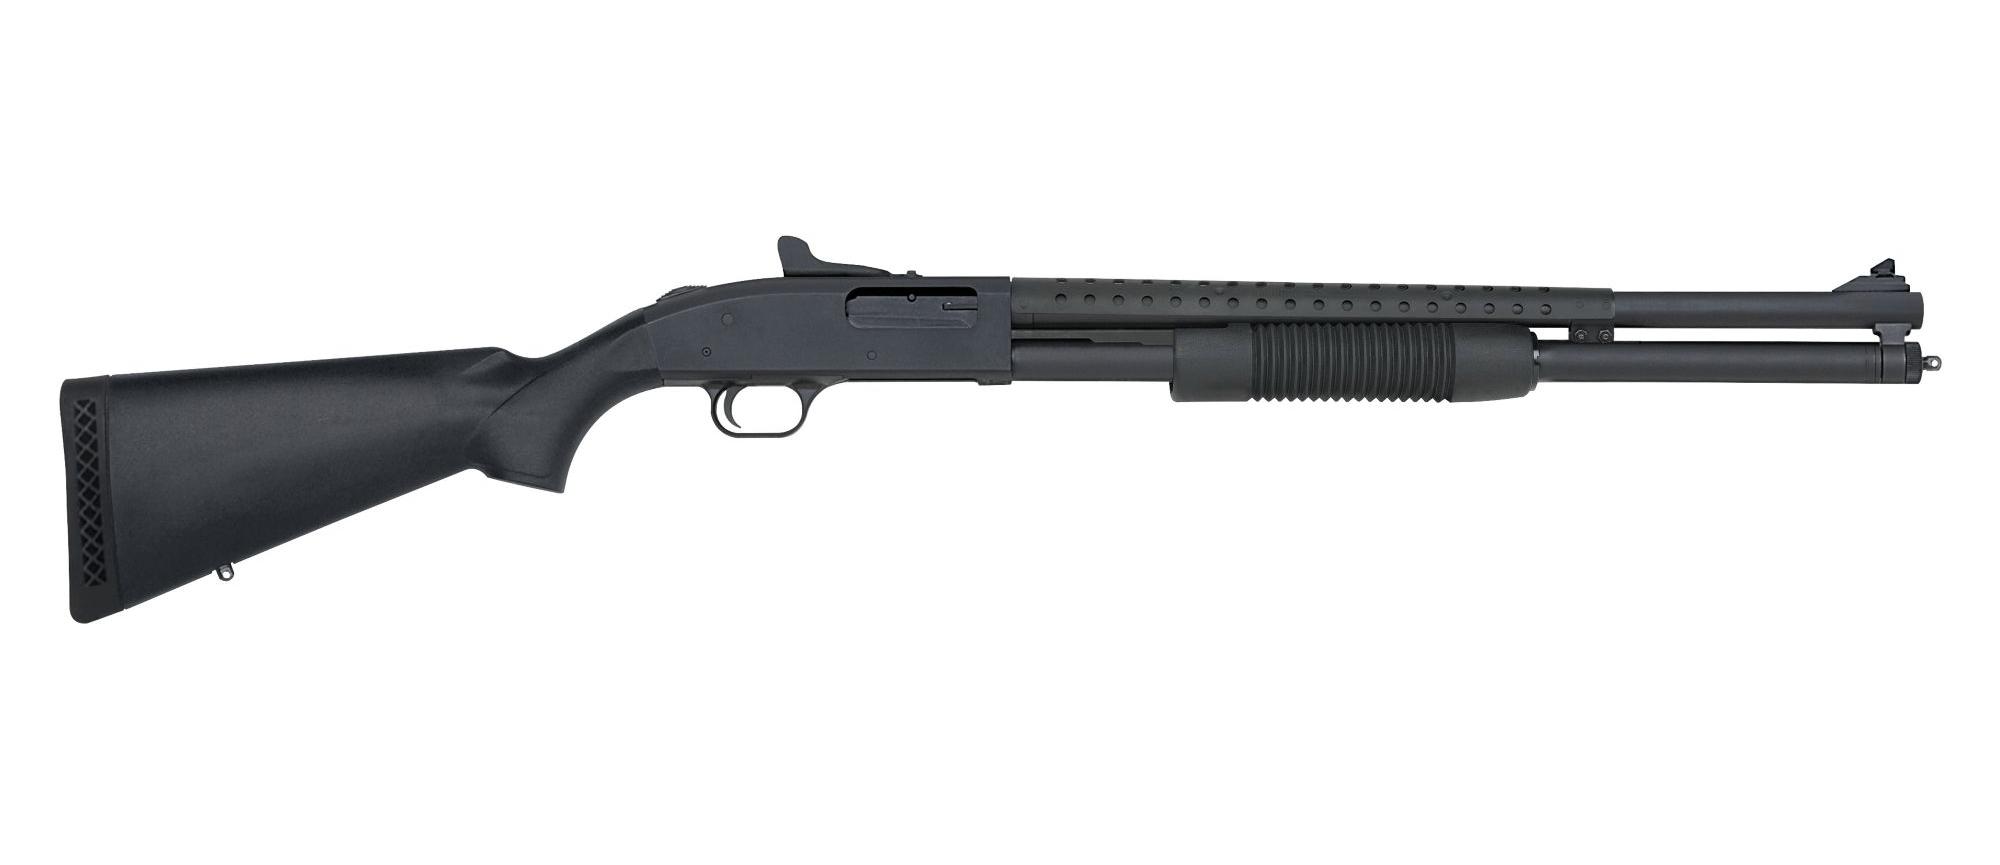 Mossberg 500 tactical shotgun